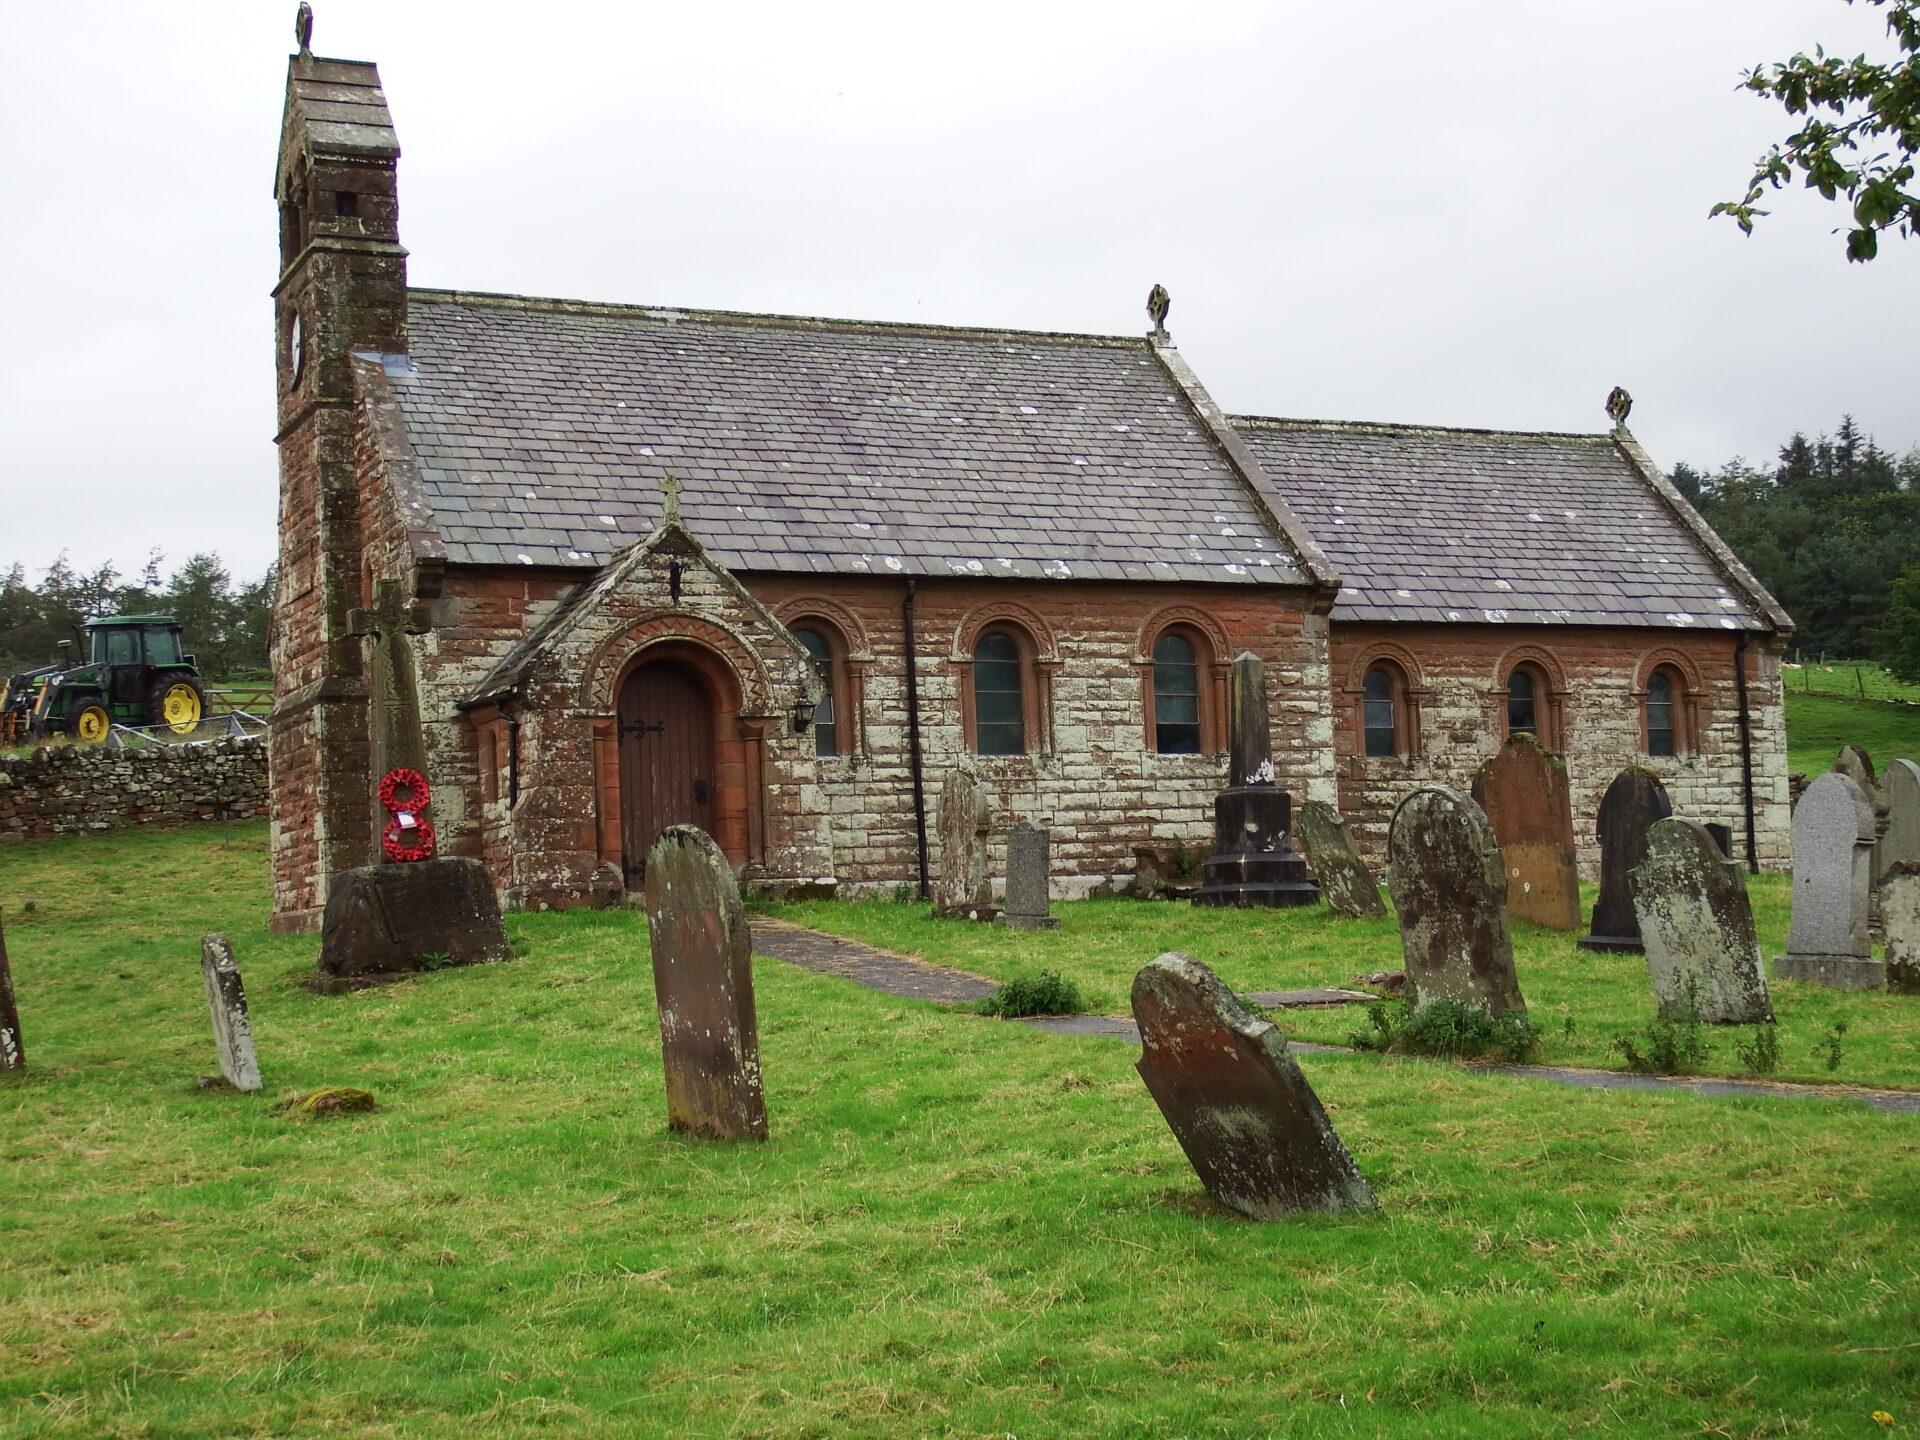 Photo of Croglin church and graveyard